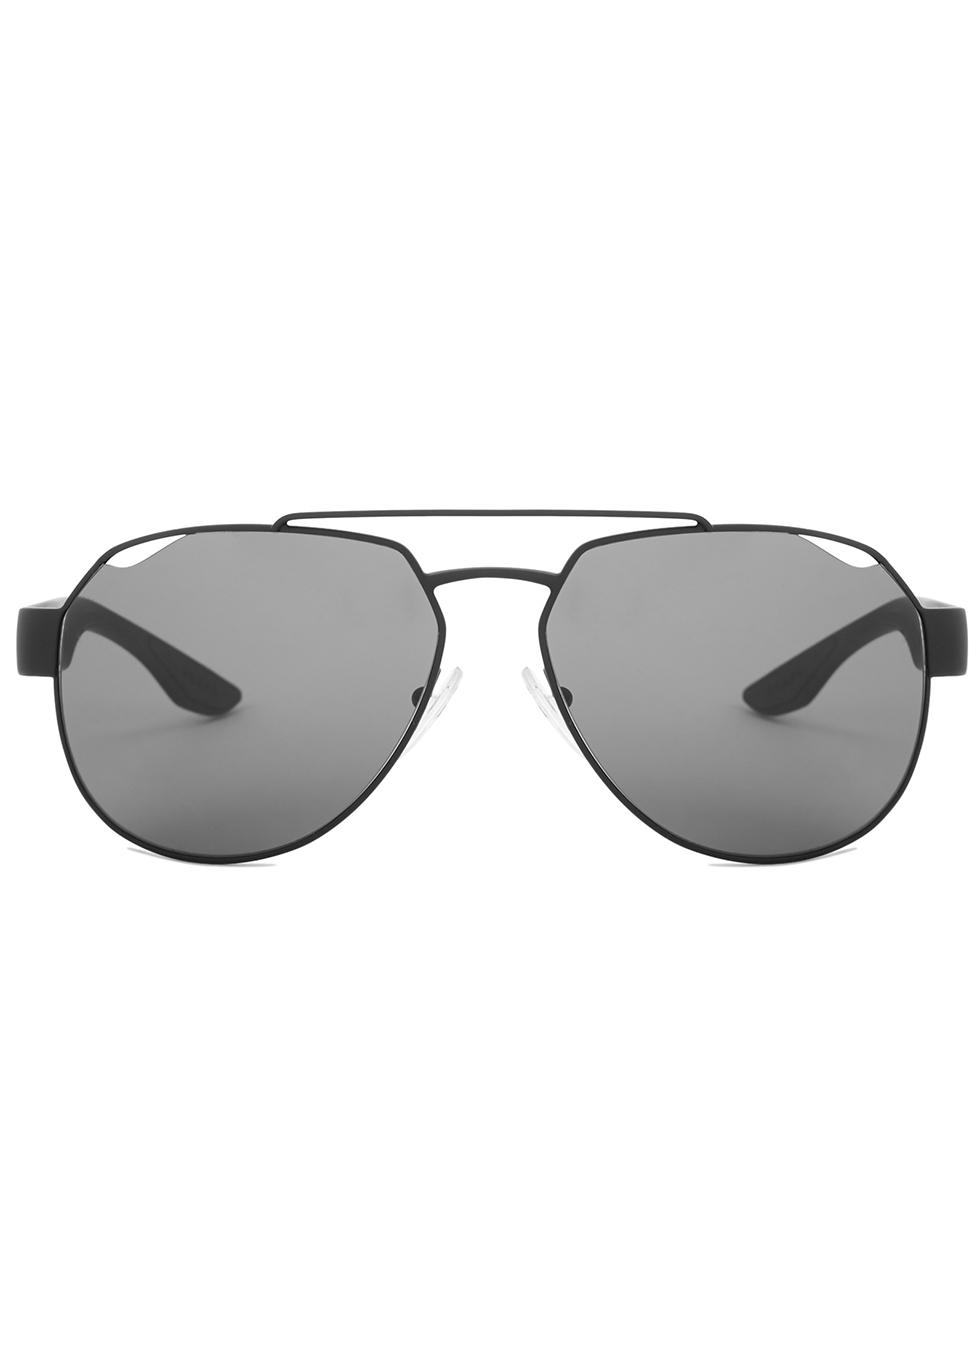 Matte black aviator-style sunglasses - Prada Linea Rossa